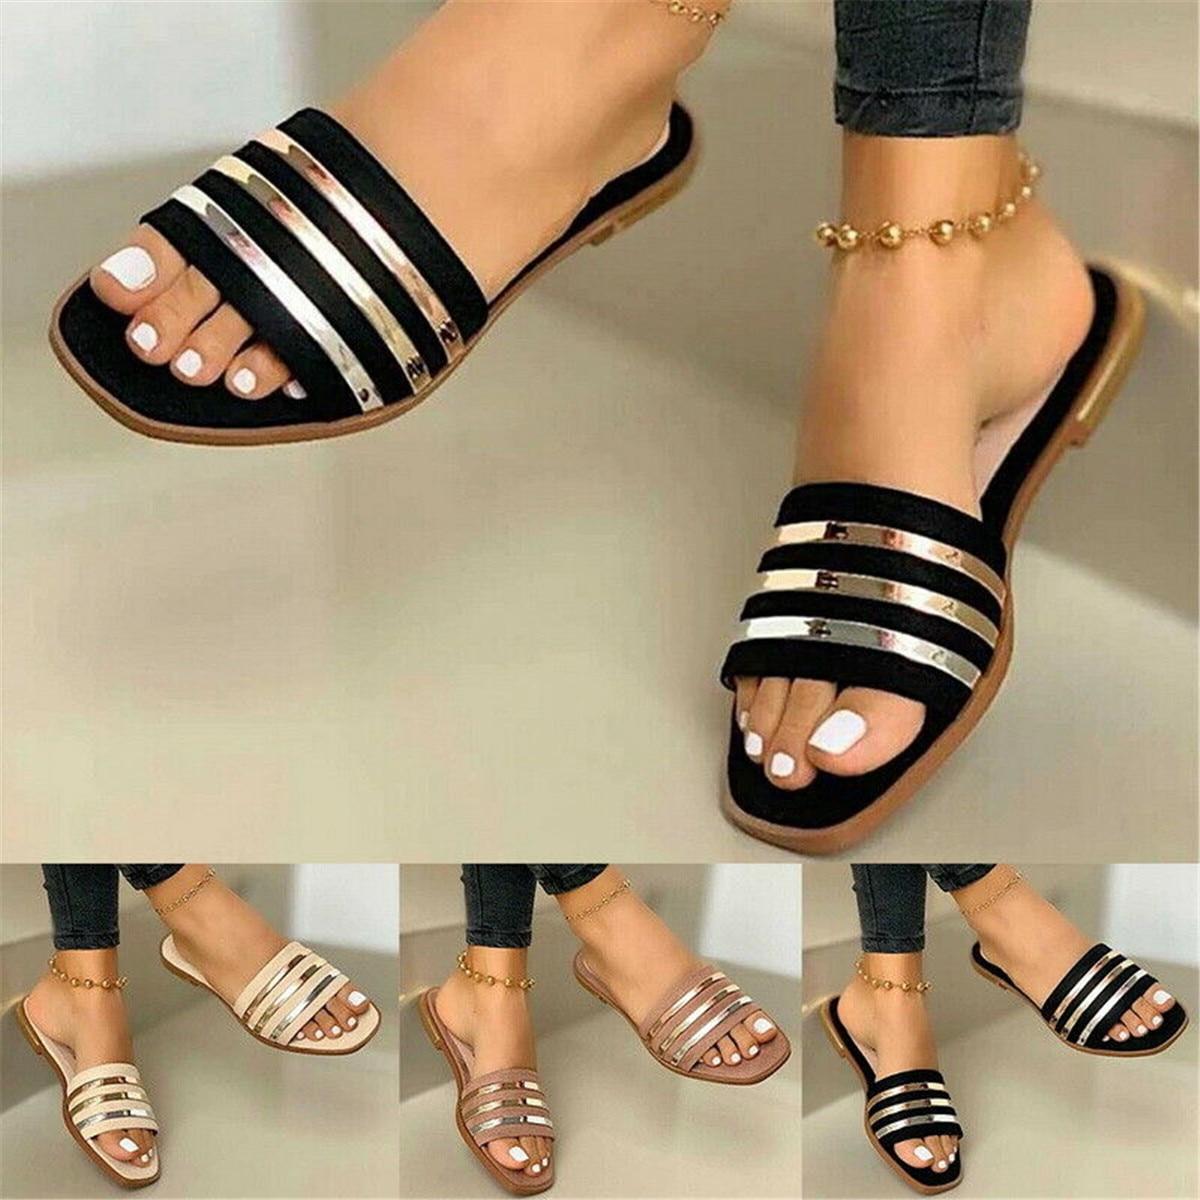 Fashion Lady Summer Open Toe Flat Slip On Sandals Beach Toe Square Shoes Slipper